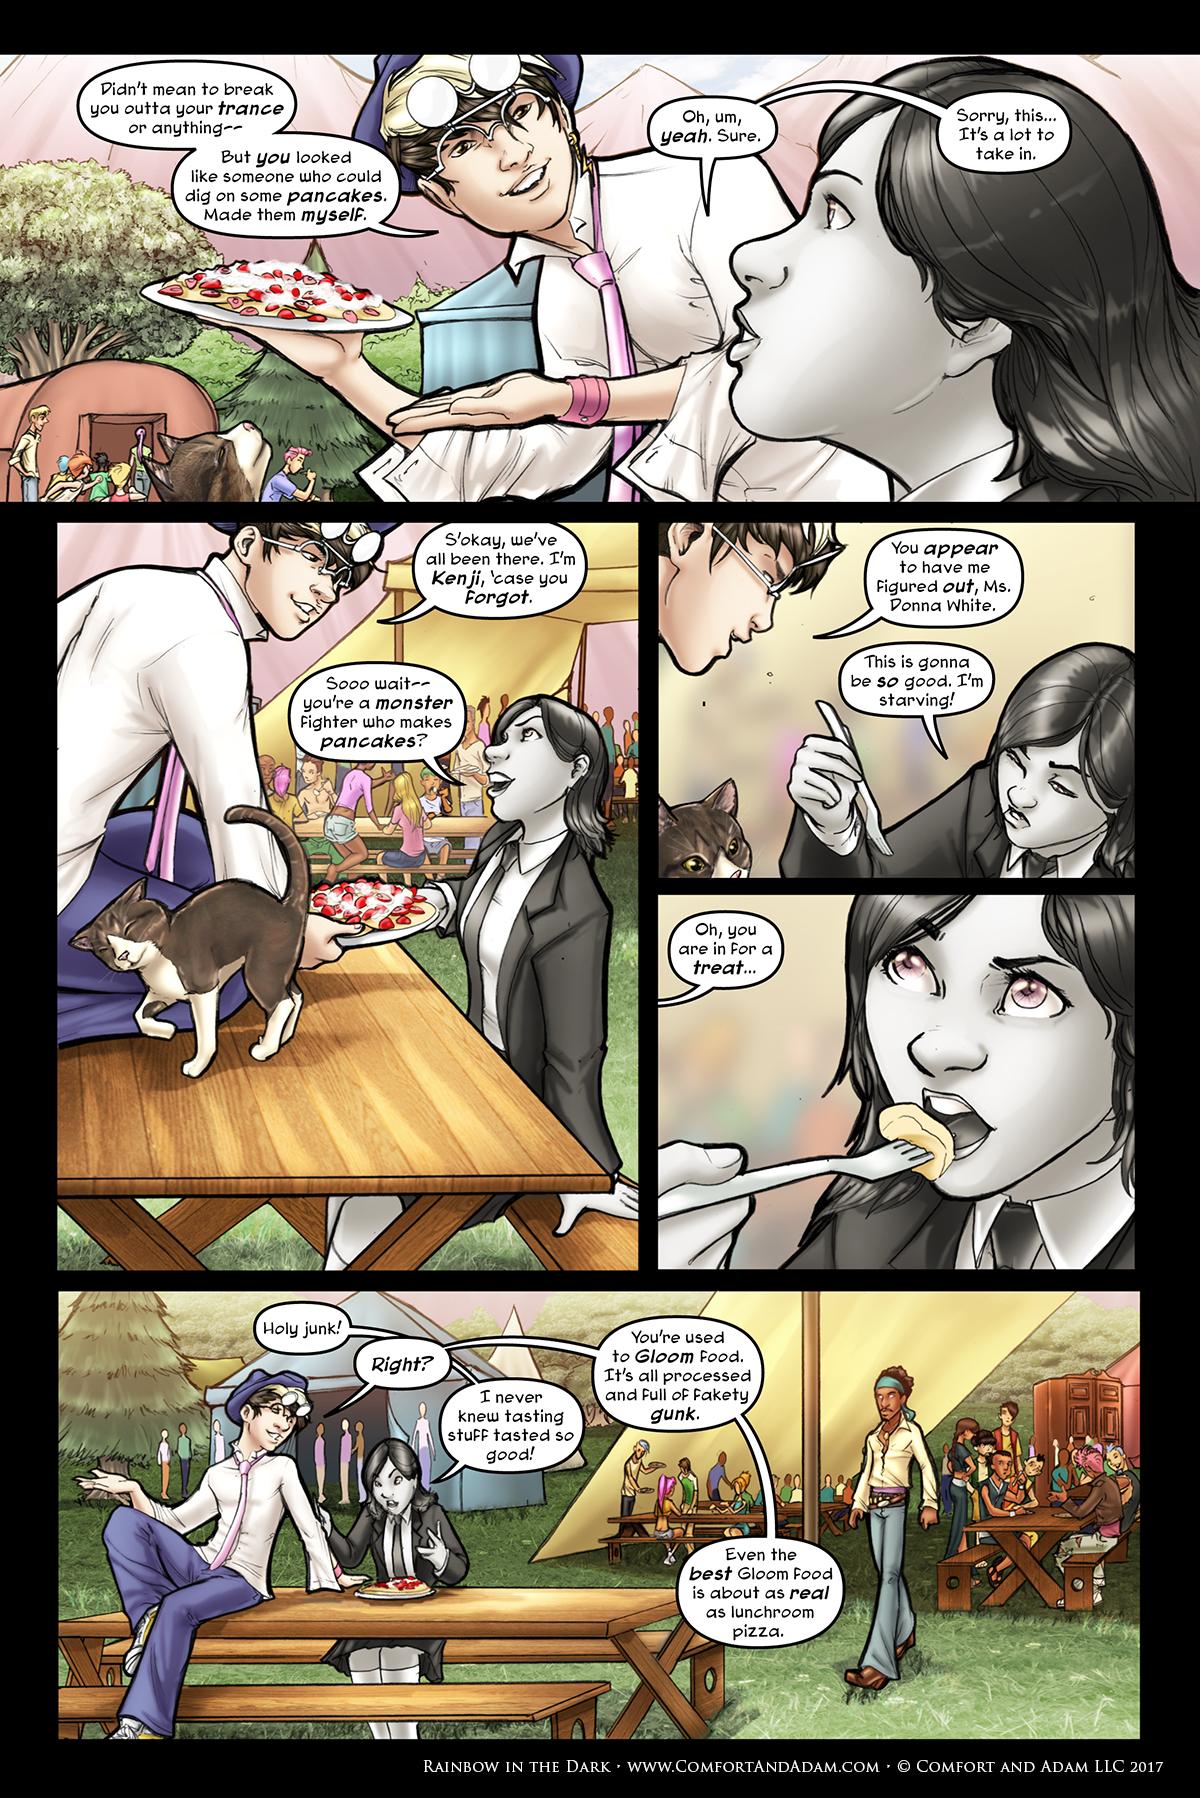 Rainbow in the Dark #2, pg. 3: Pancakes!